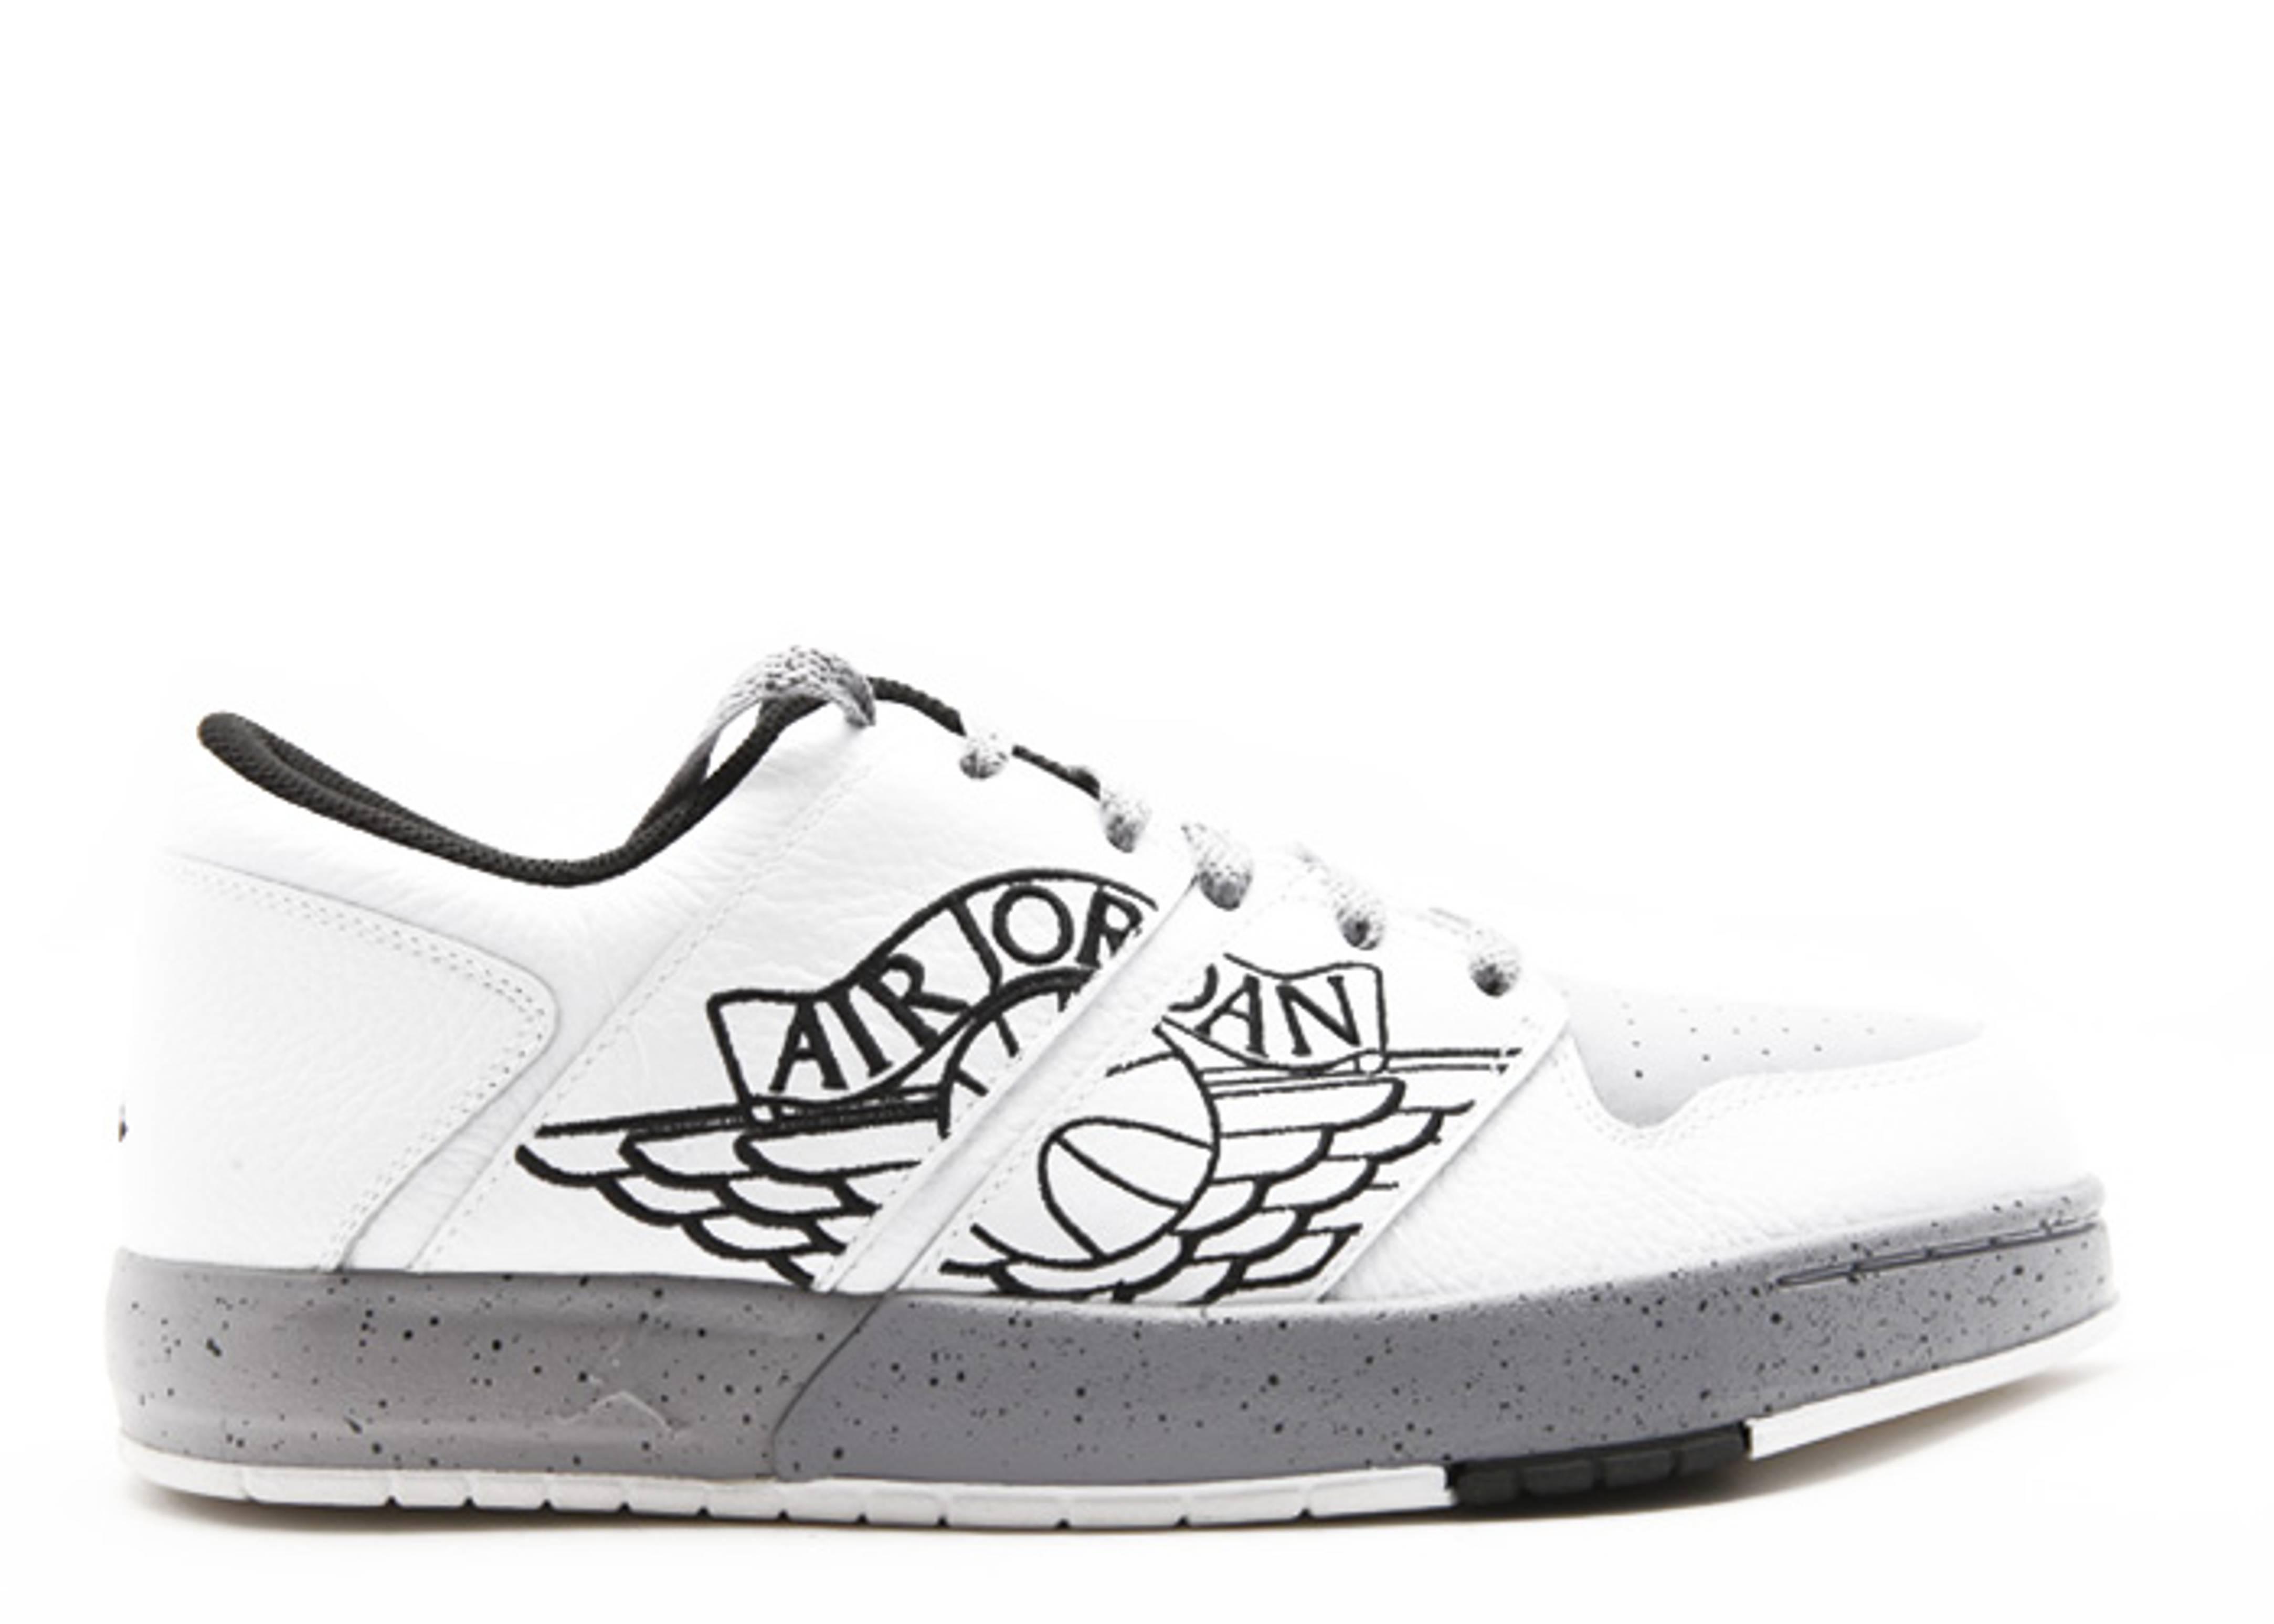 f9ddac69d0a7eb Nu Retro 1 Low - Air Jordan - 317163 106 - white black-cement grey ...